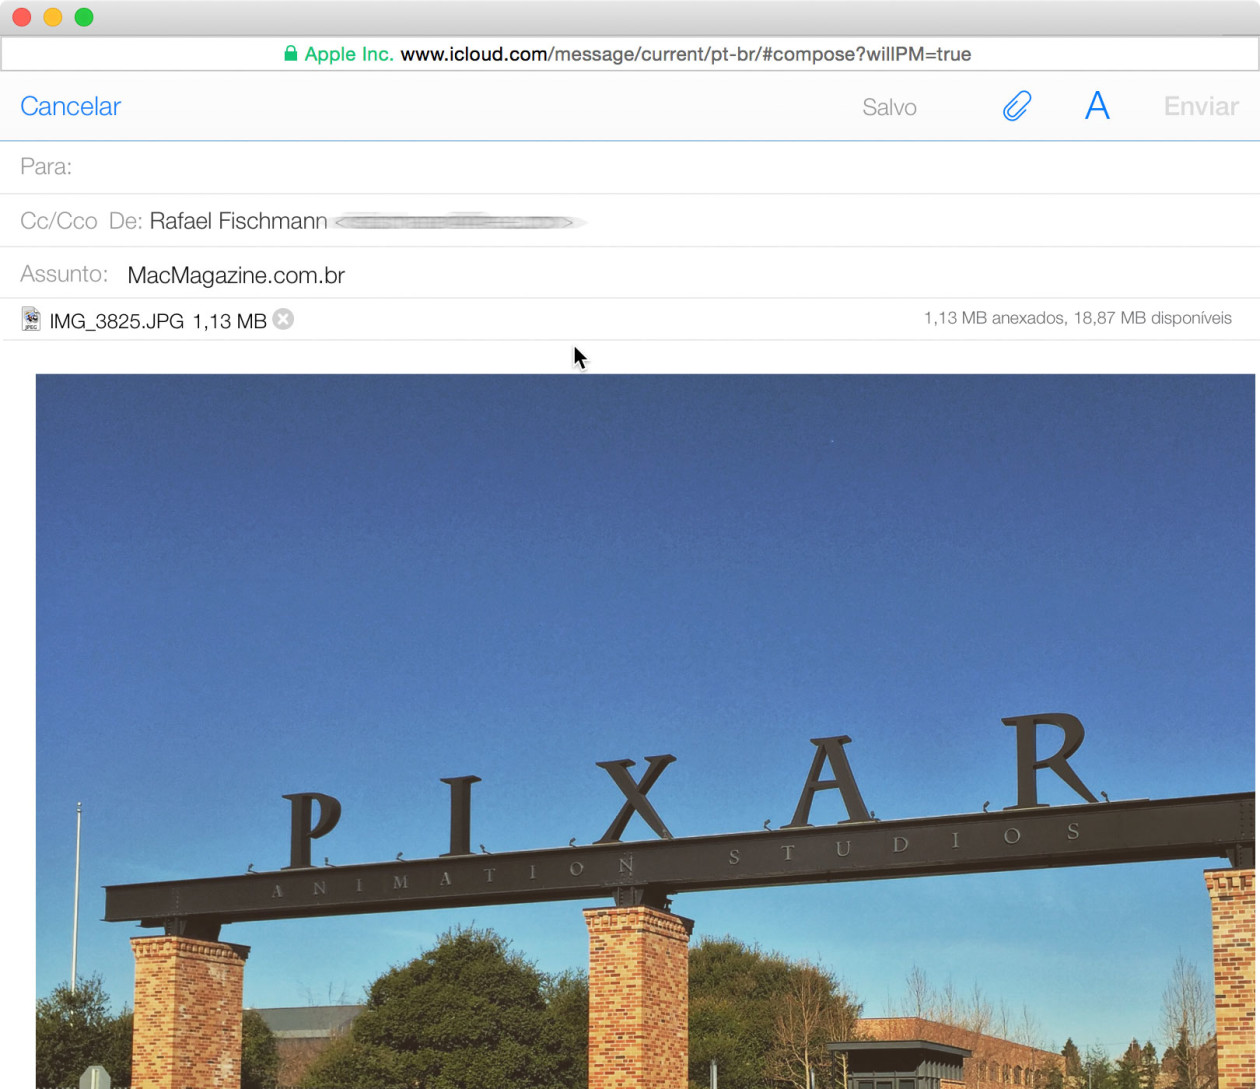 Fotos no iCloud.com